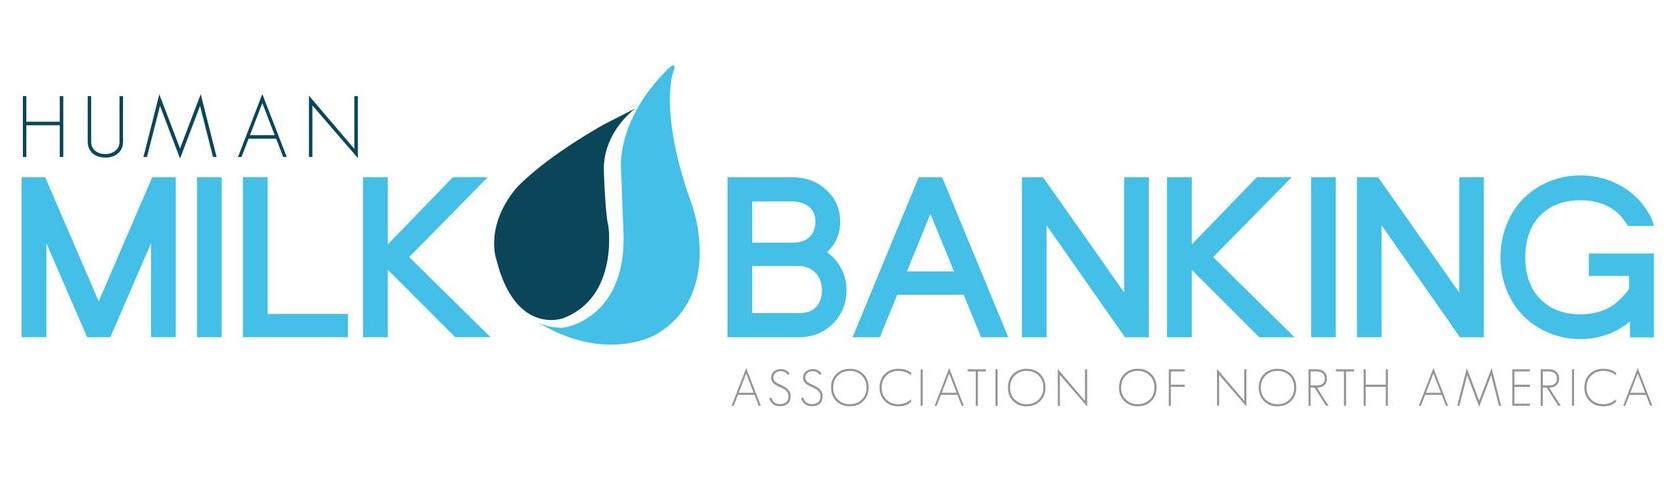 New HMBANA Logo.jpg